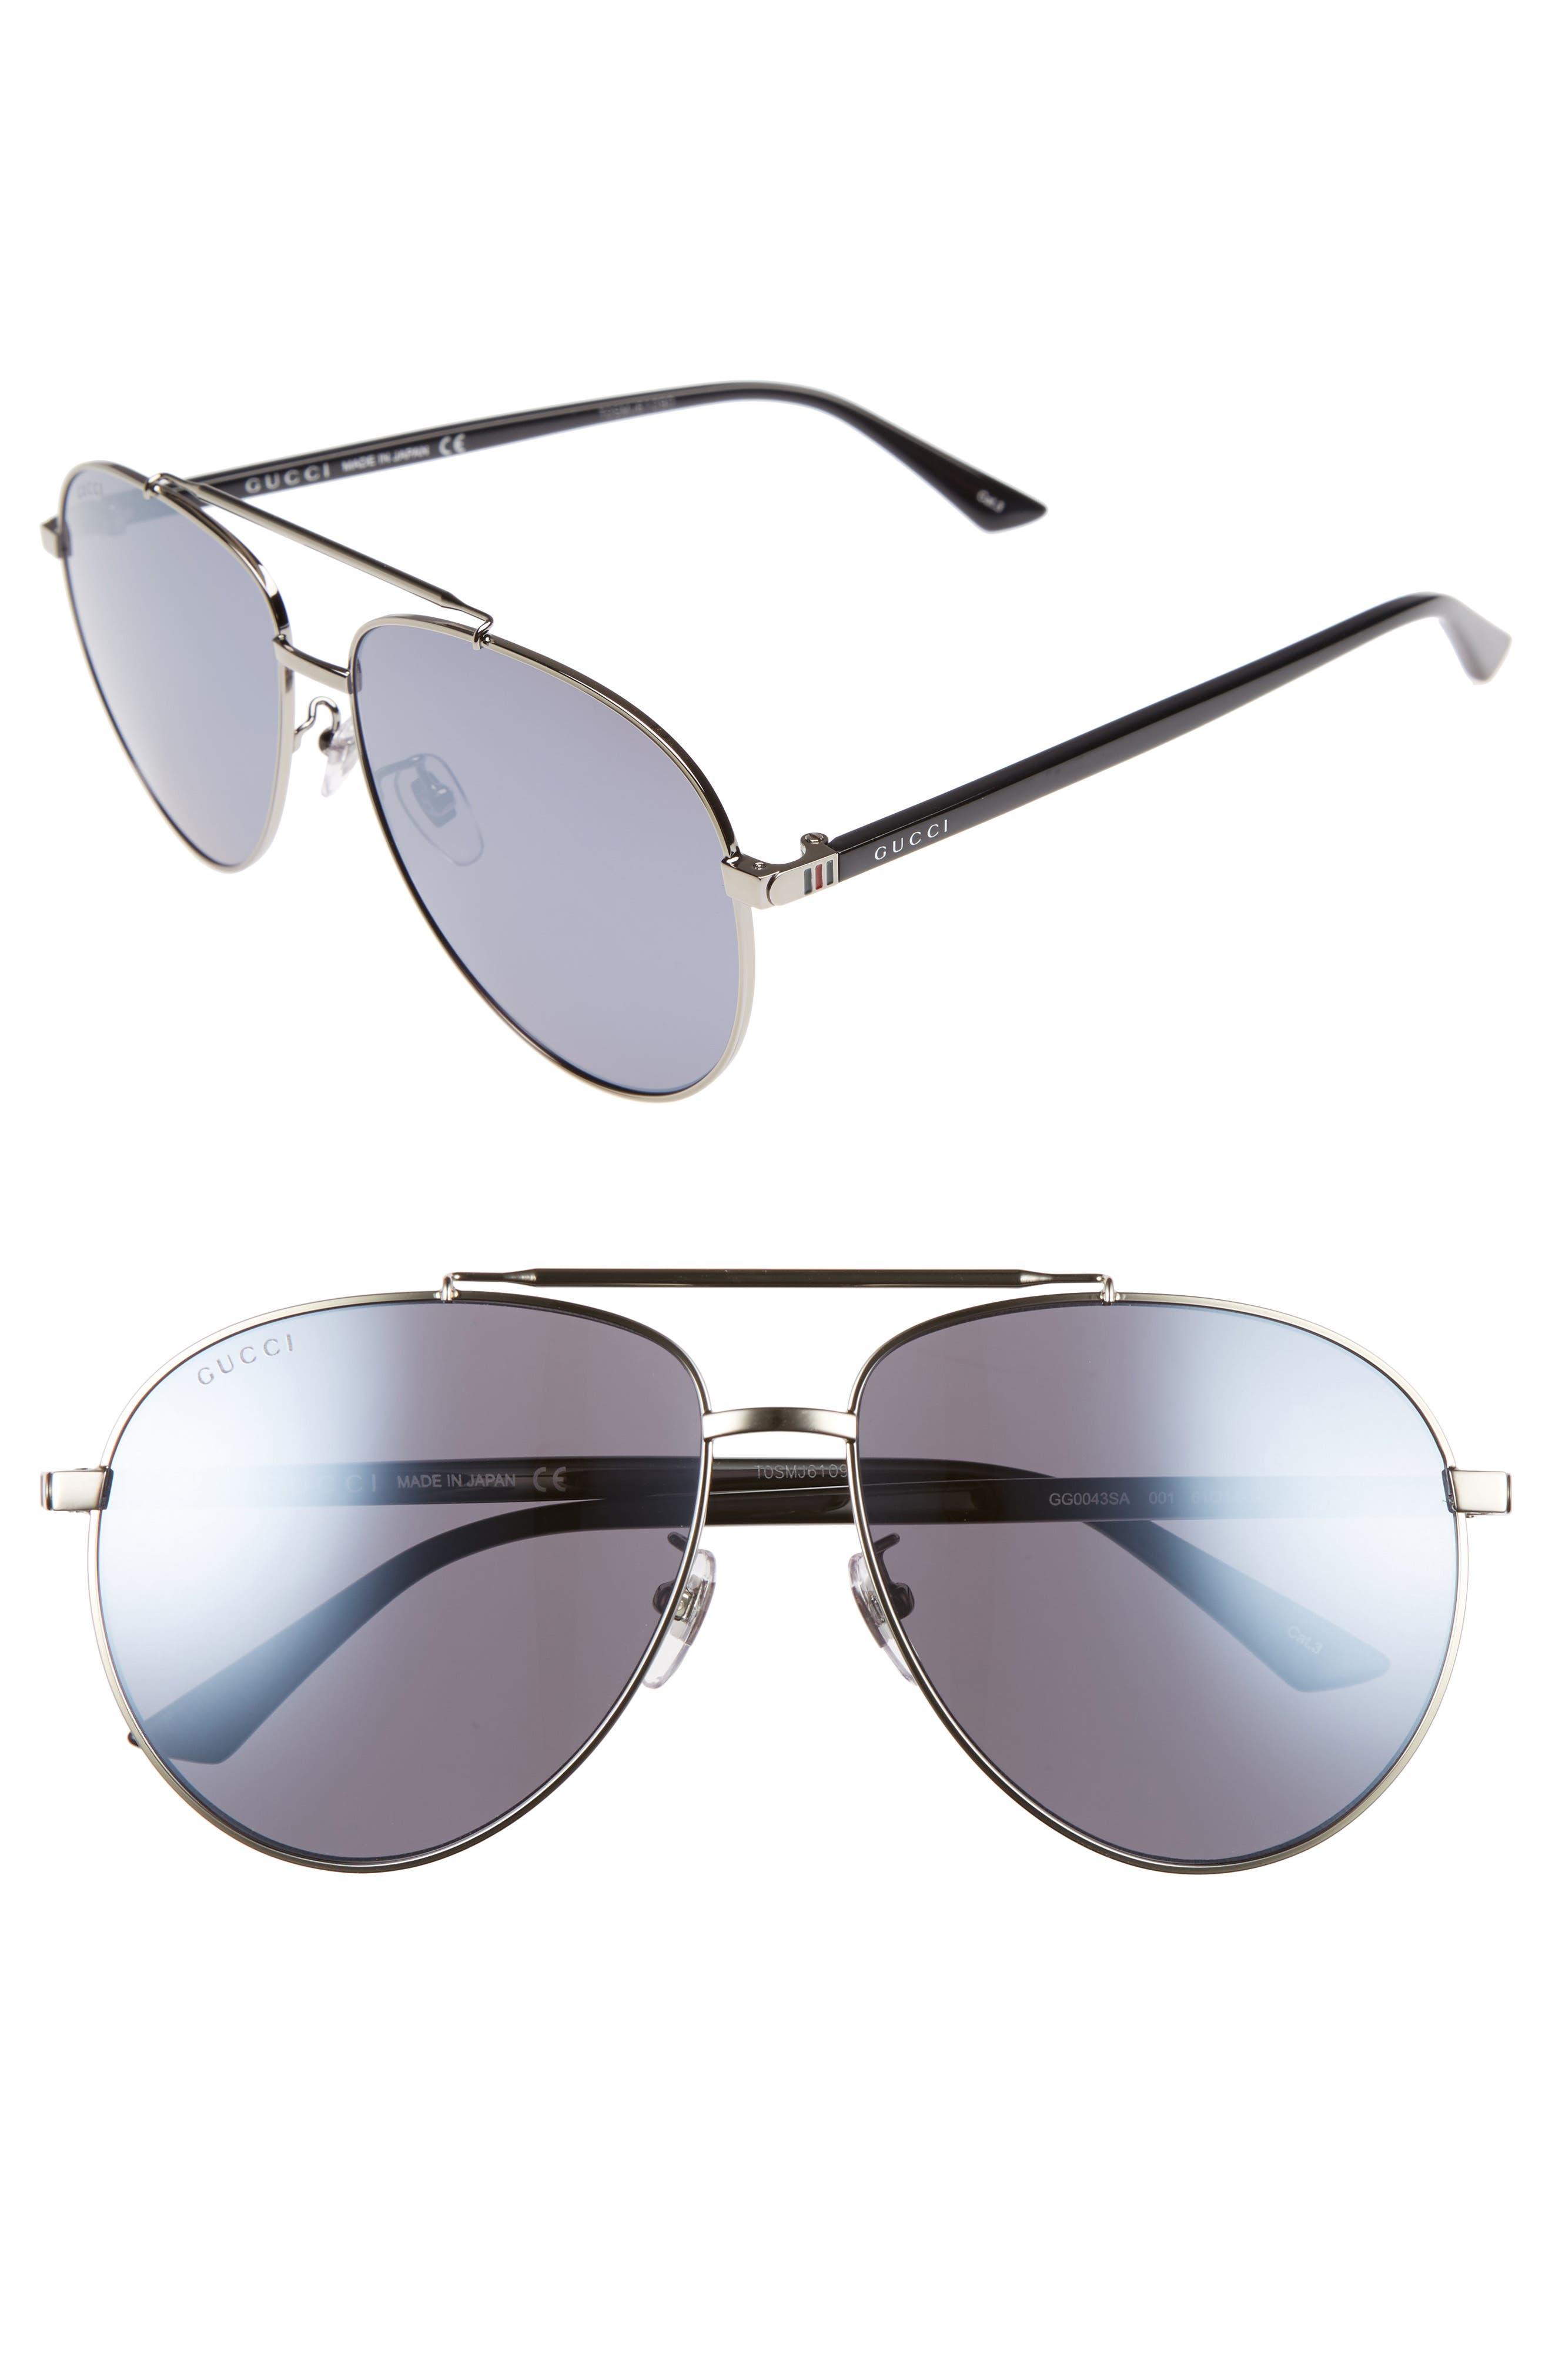 61mm Aviator Sunglasses,                         Main,                         color, 040